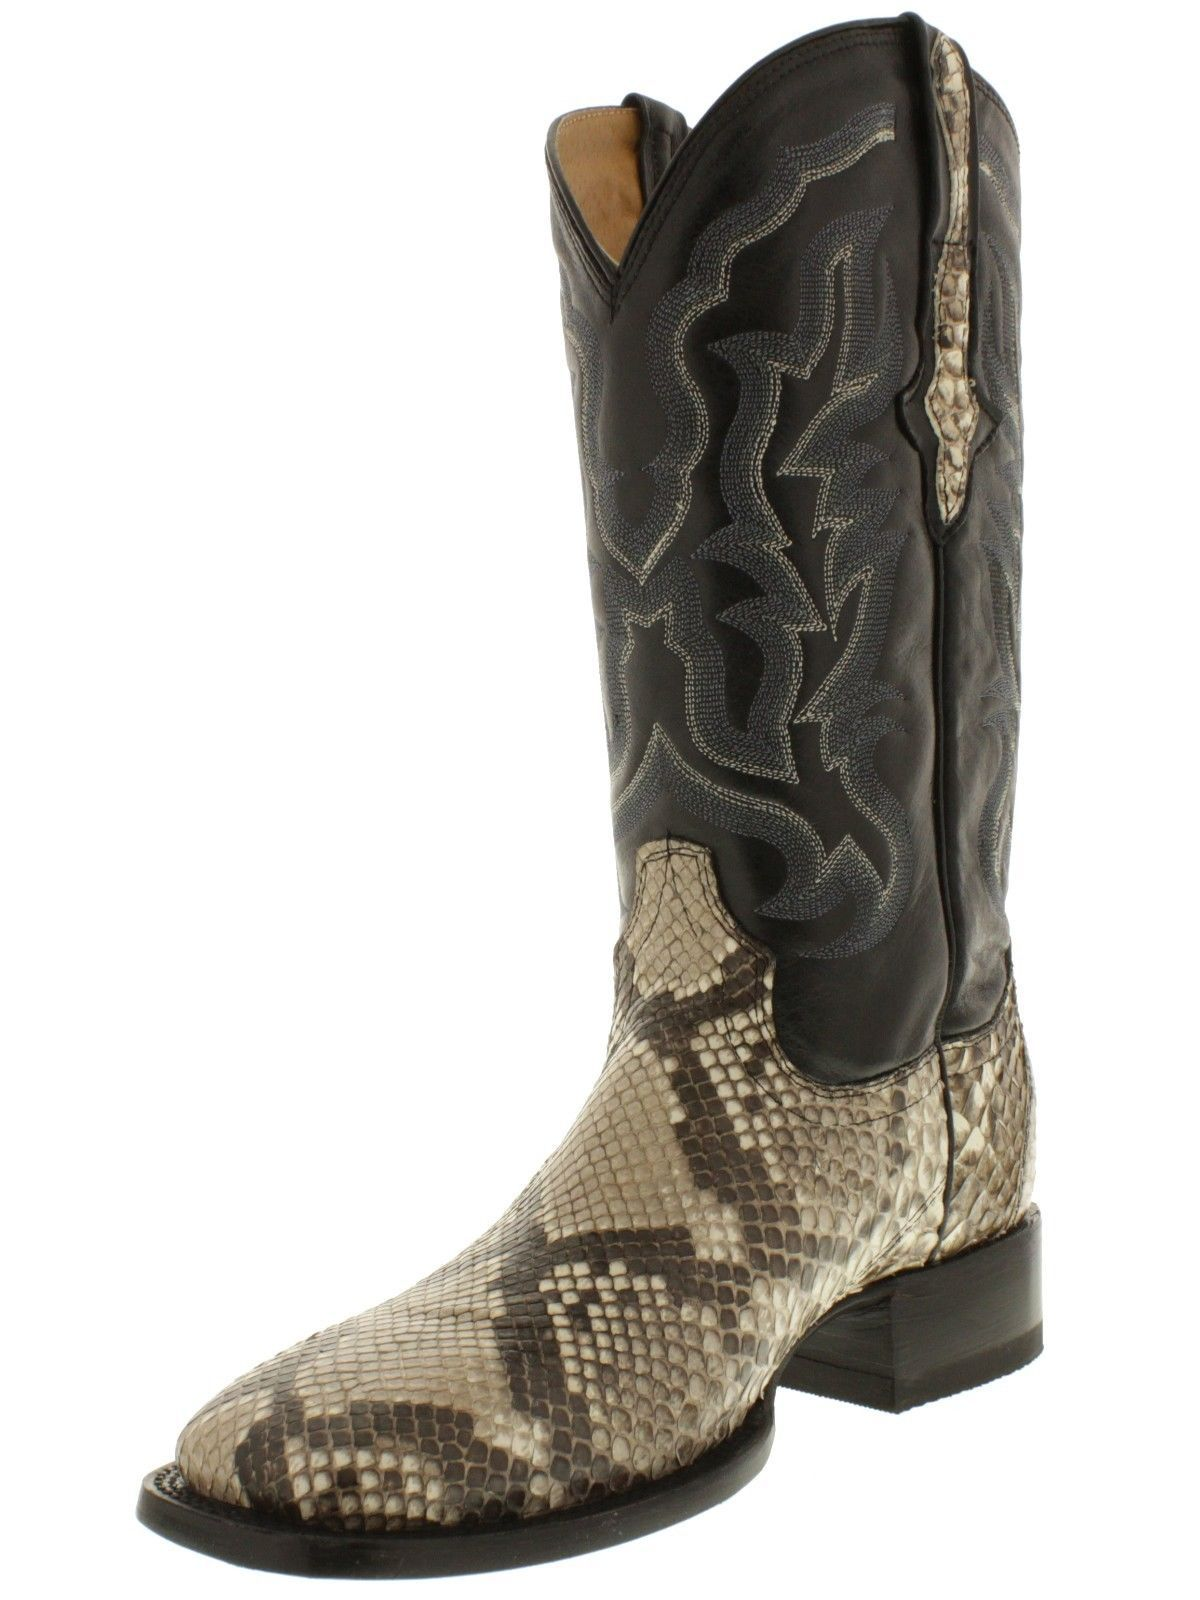 Men/'s Brown Python Snake Design Leather Western Cowboy Boots Square Toe